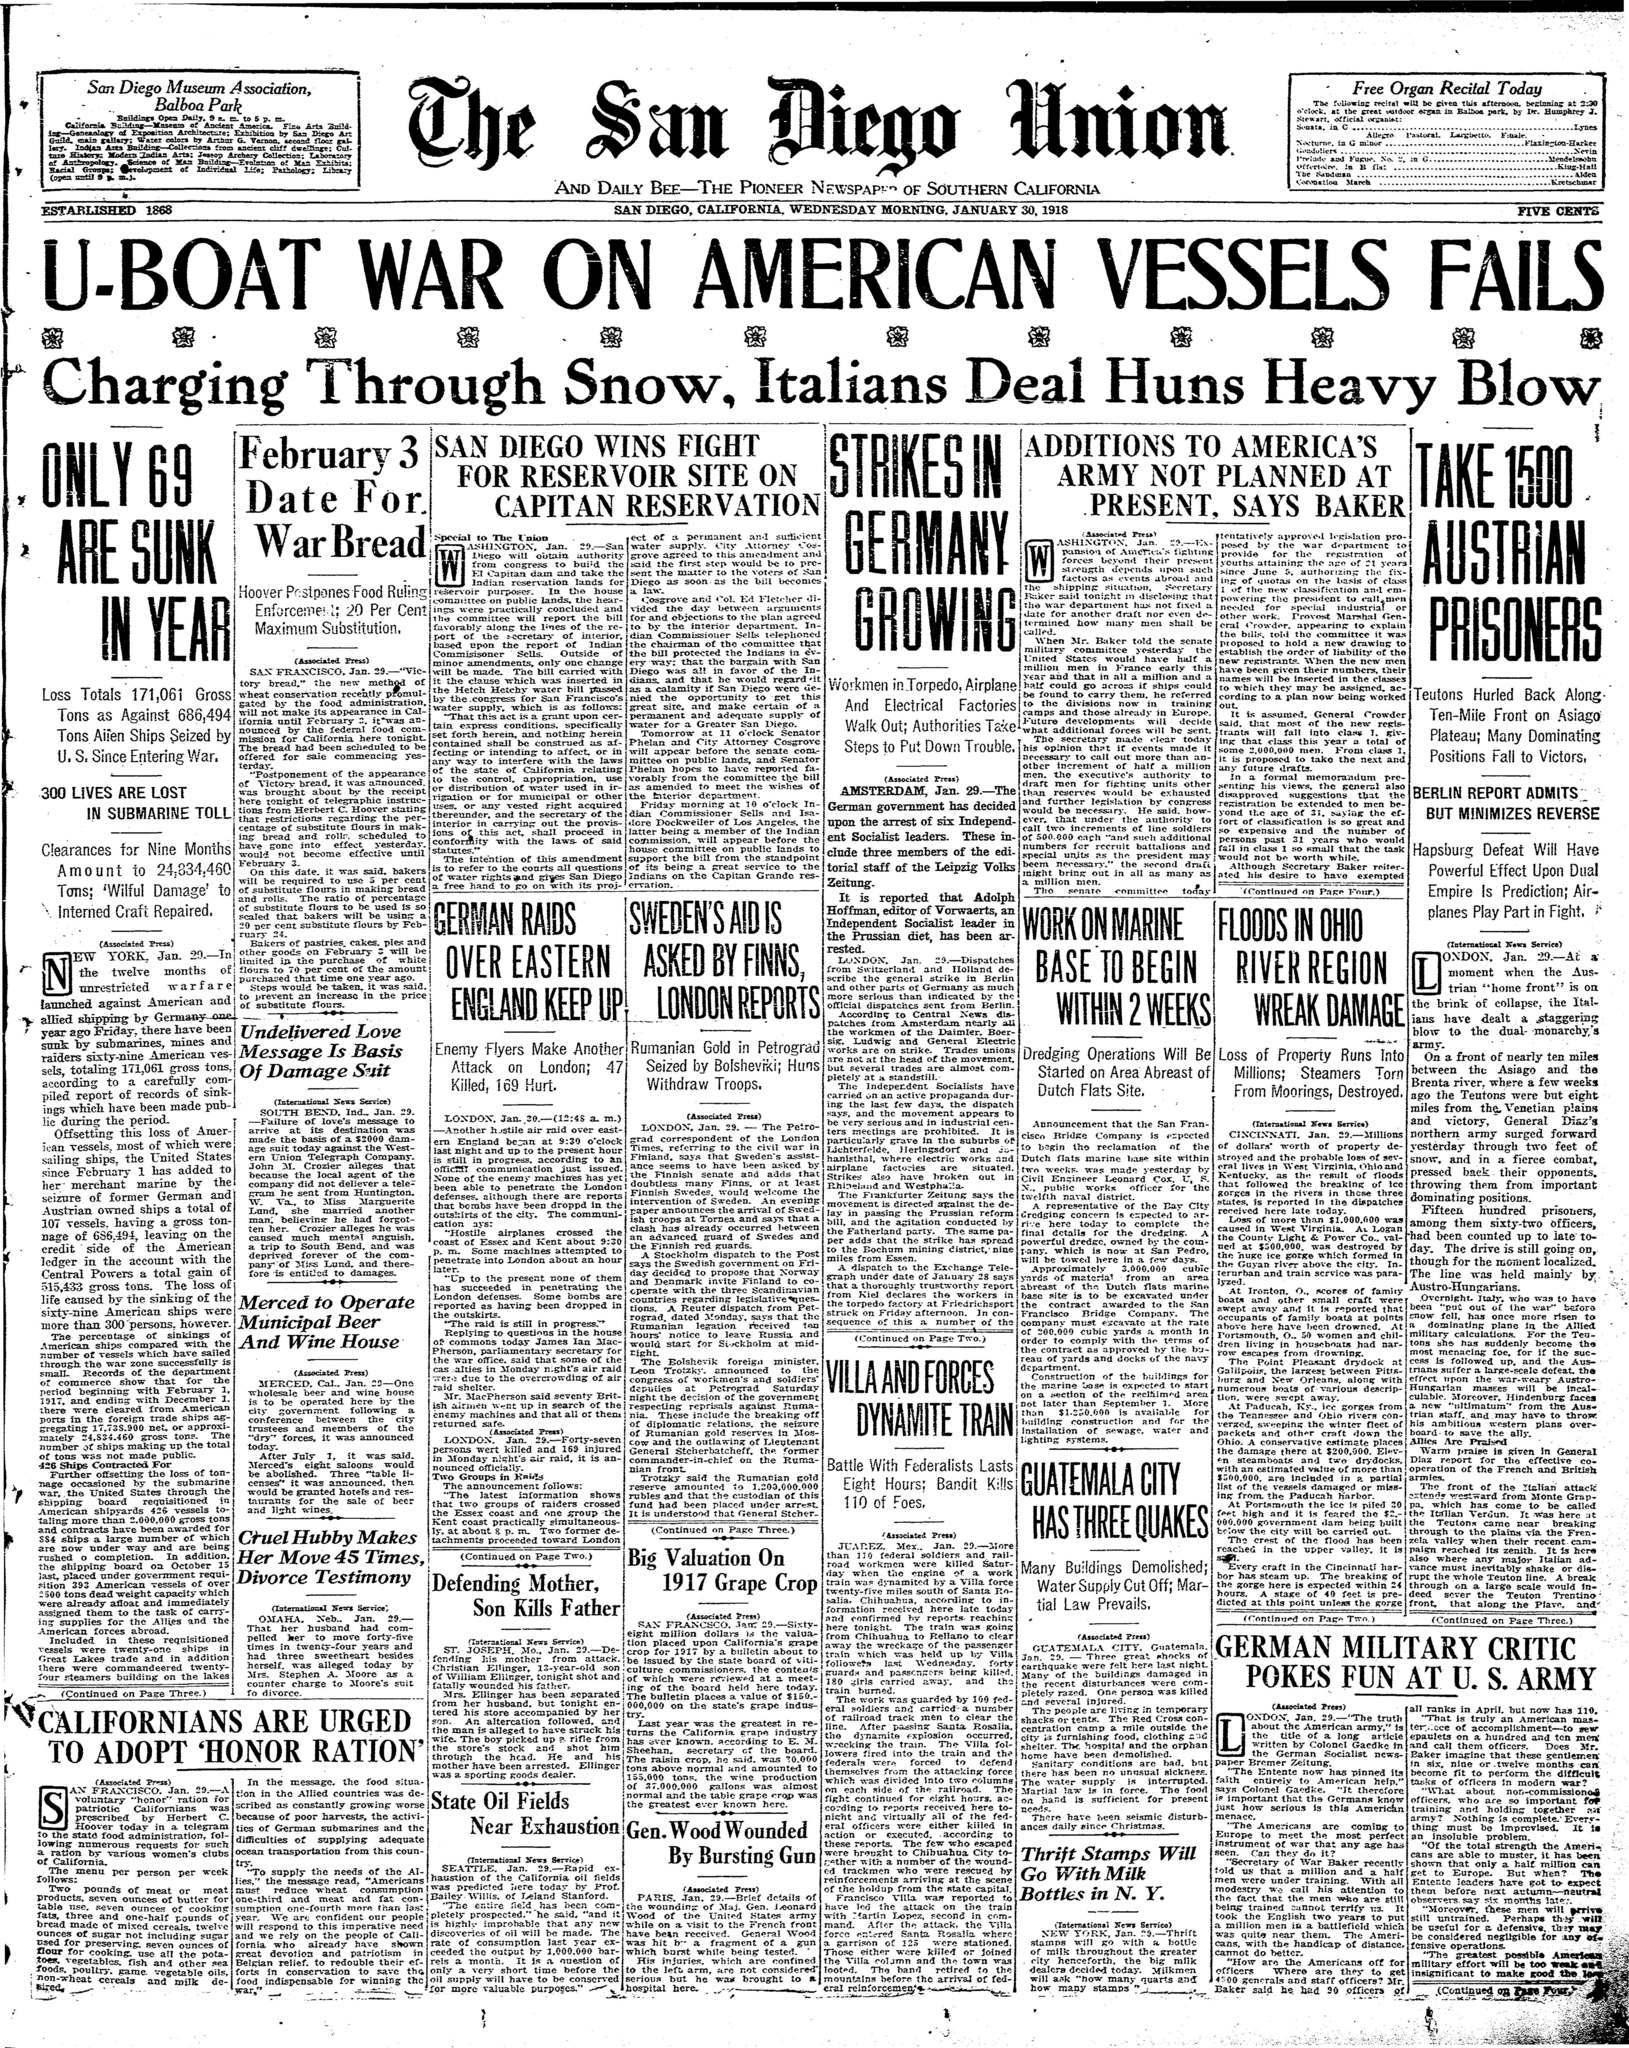 January 30, 1918